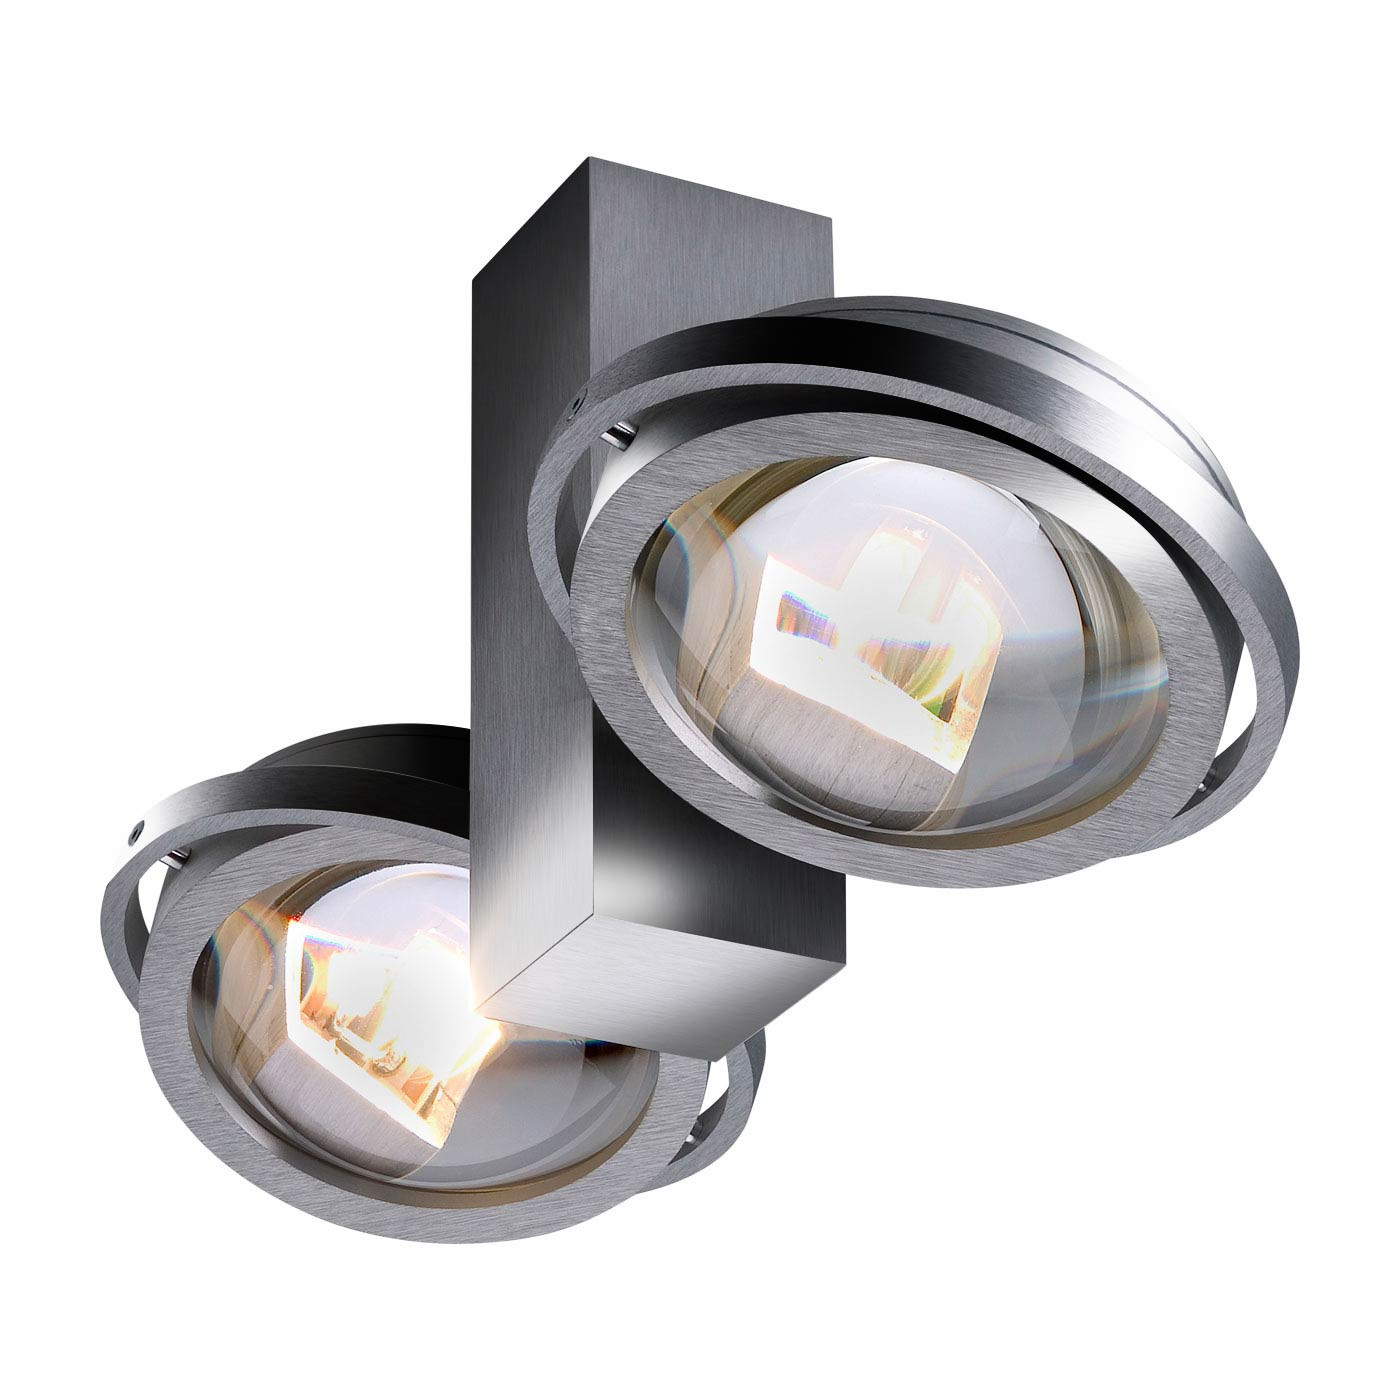 Delight Logos Led Office Spot 2 Ceiling Spotlight